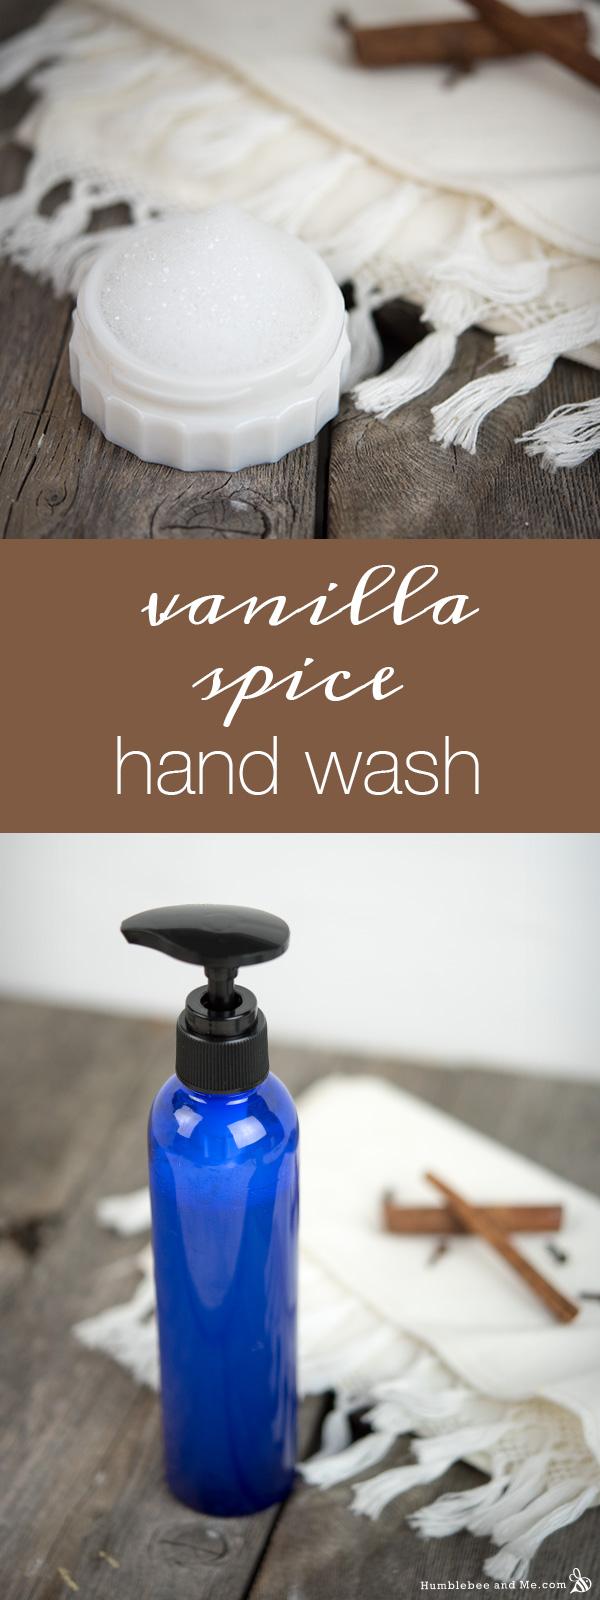 How to Make Vanilla Spice Hand Wash